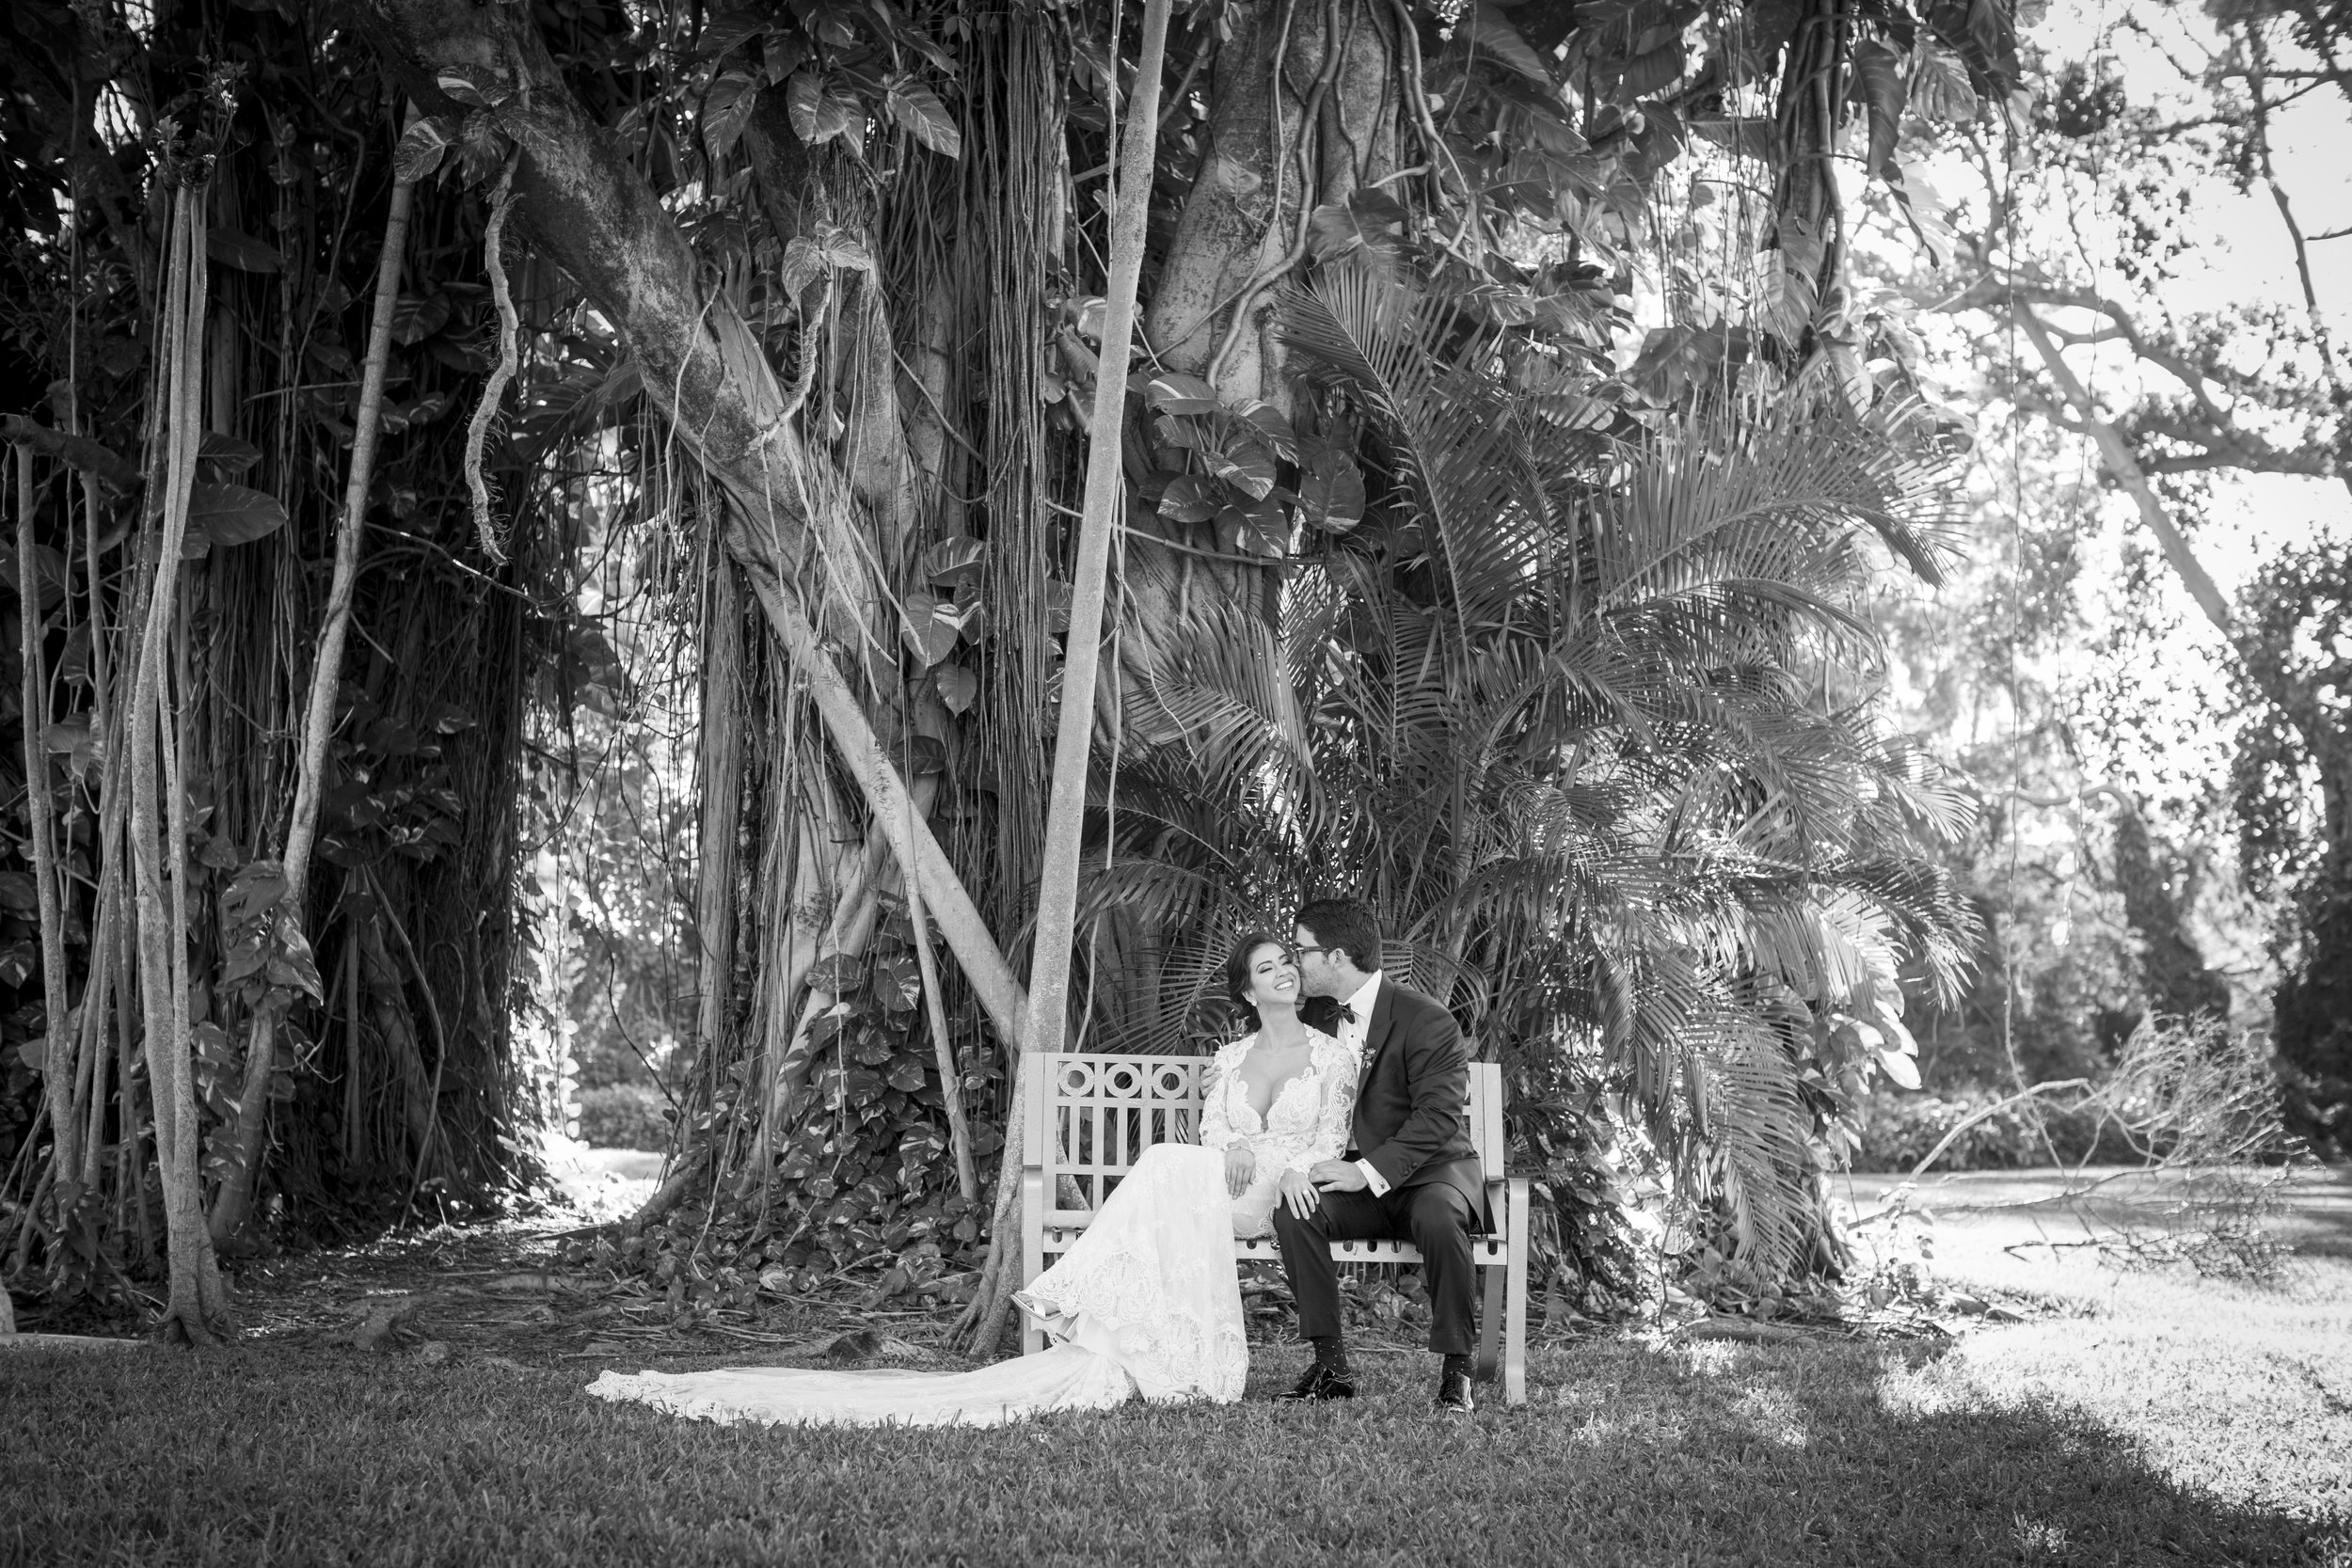 Berger Wedding - 668.jpg